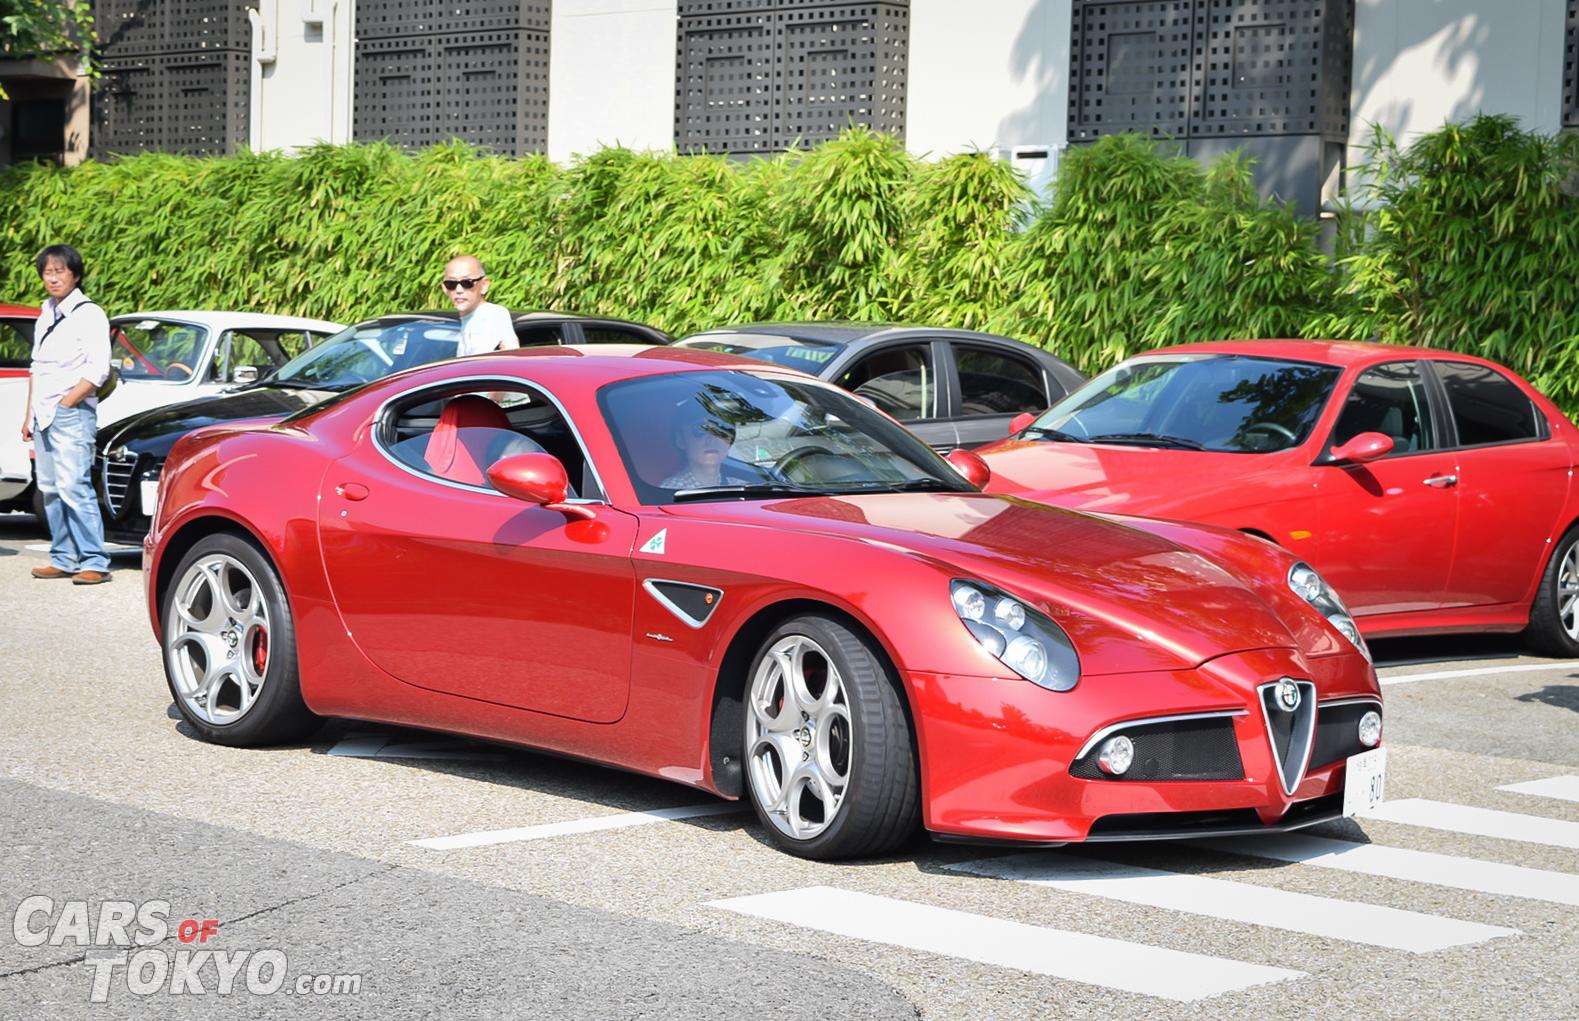 Cars of Tokyo Daikanyama Alfa Romeo 8C